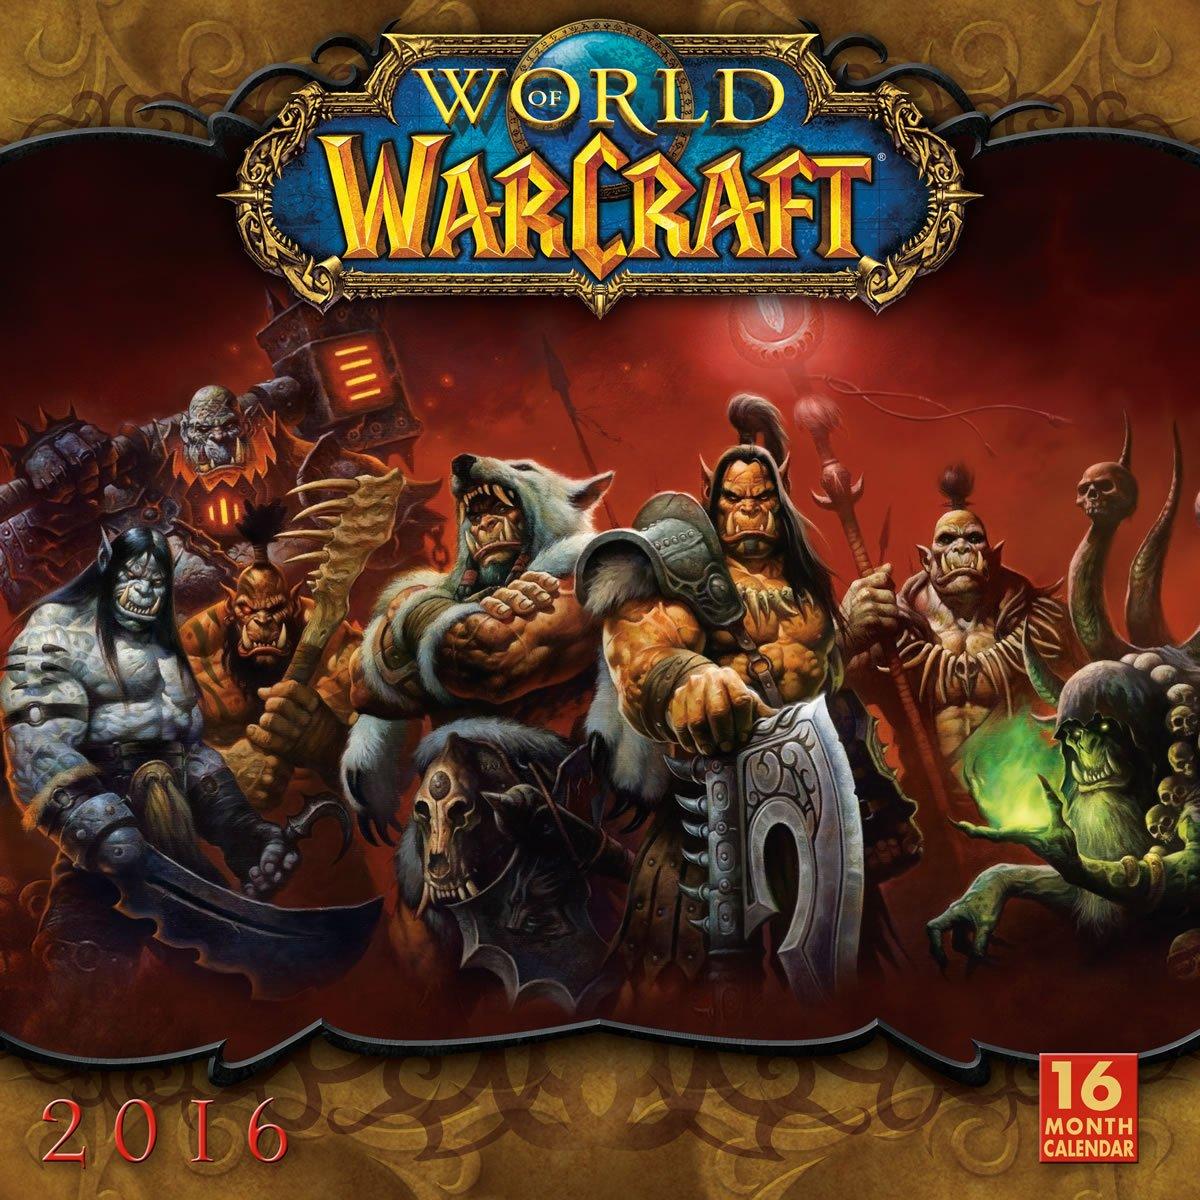 World Of Warcraft 2016 Wall Calendar Blizzard Entertainment 9781416297833 Amazon Com Books